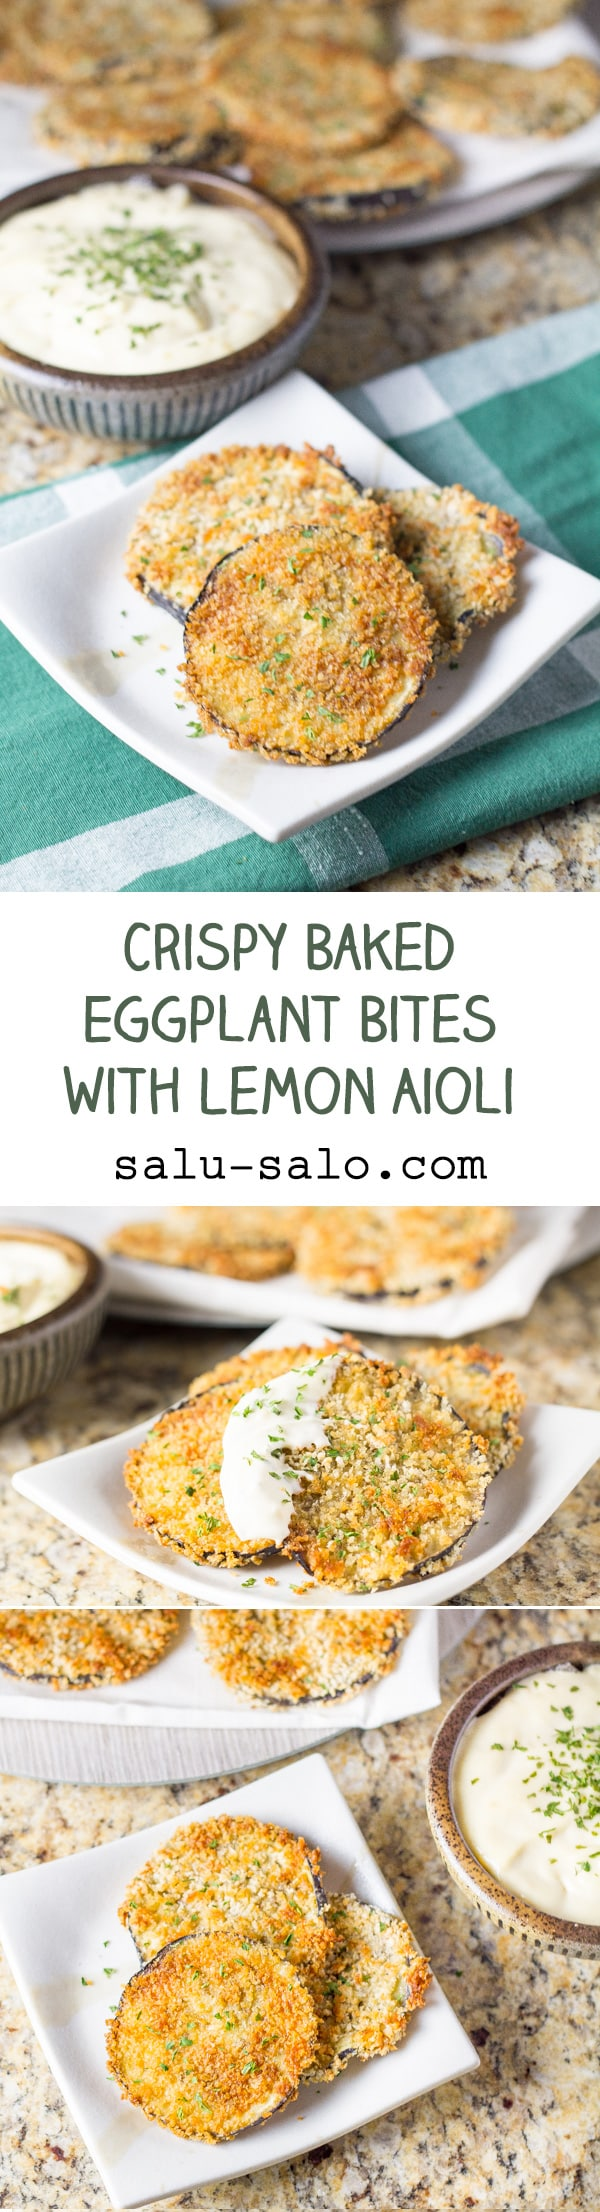 Crispy Baked Eggplant Bites with Lemon Aiol